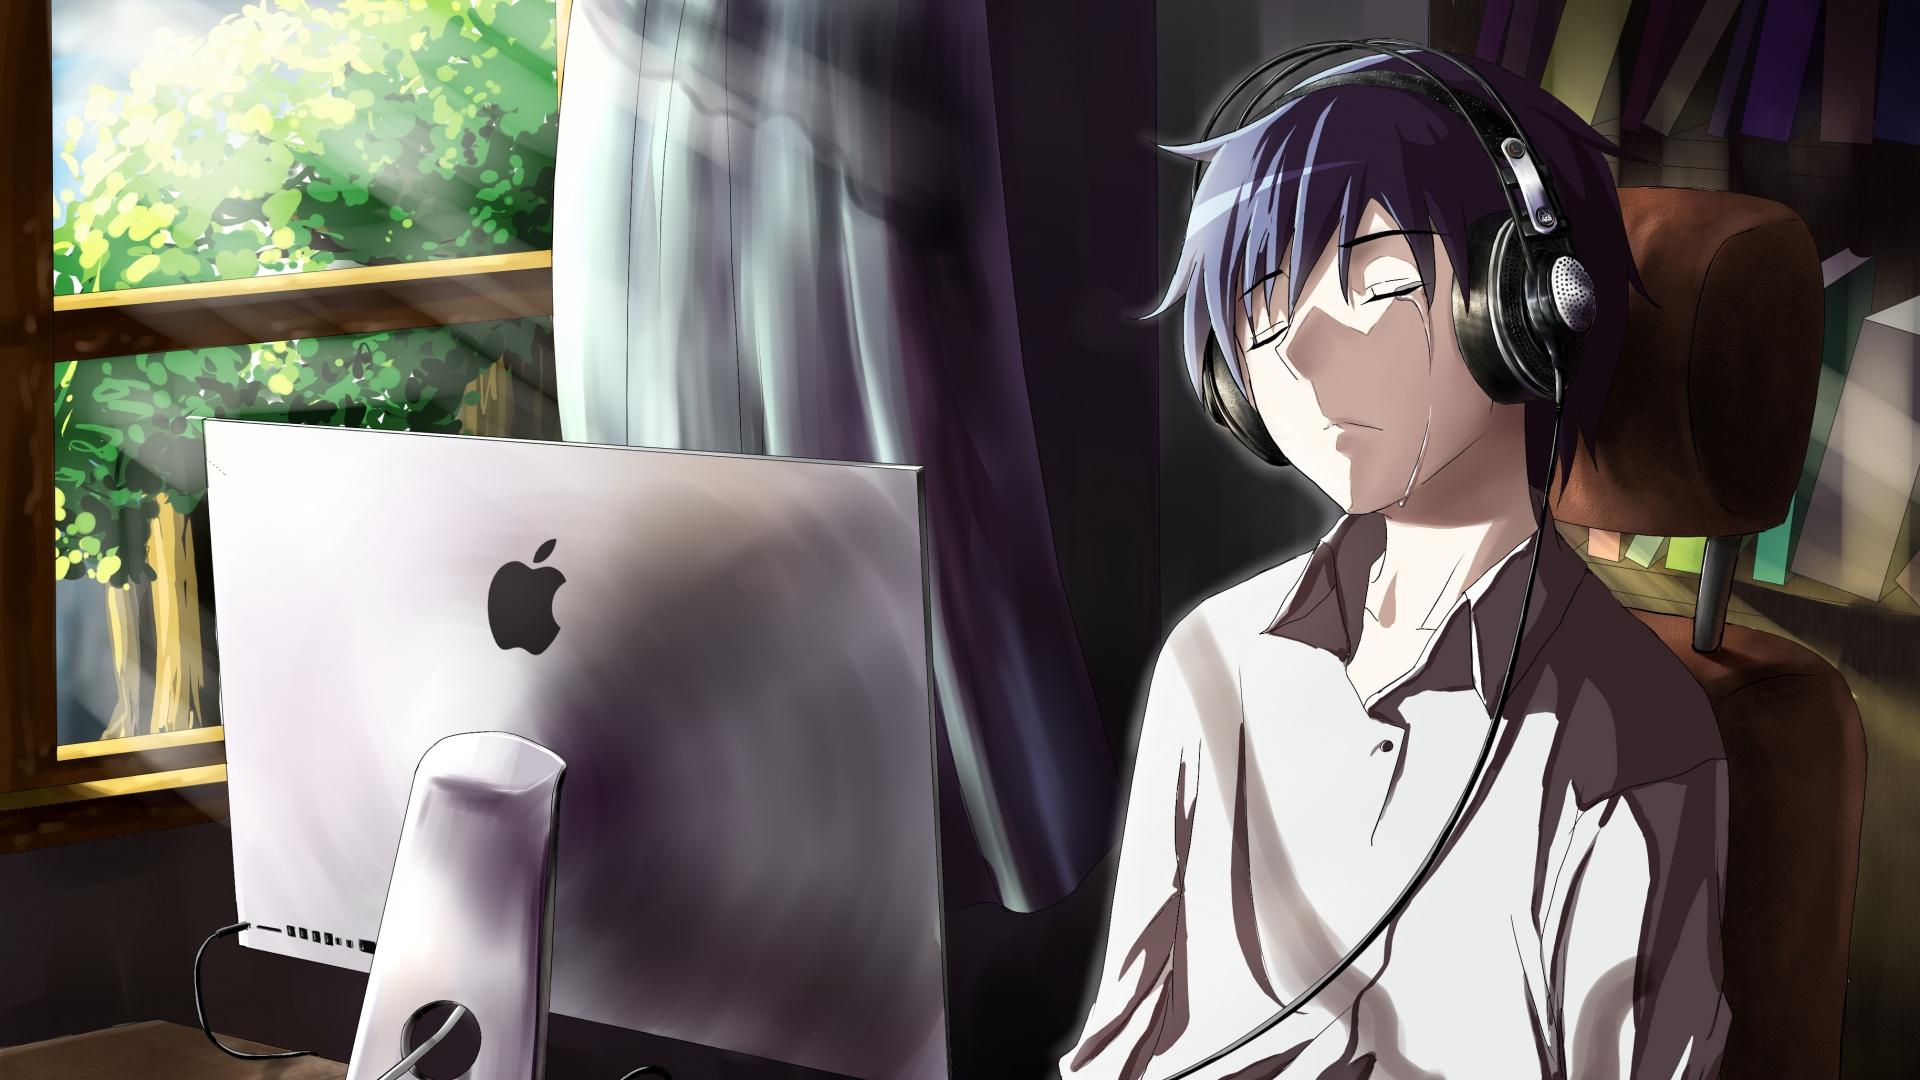 Anime Guy Crying Hd Wallpaper Hintergrund 1920x1080 Id